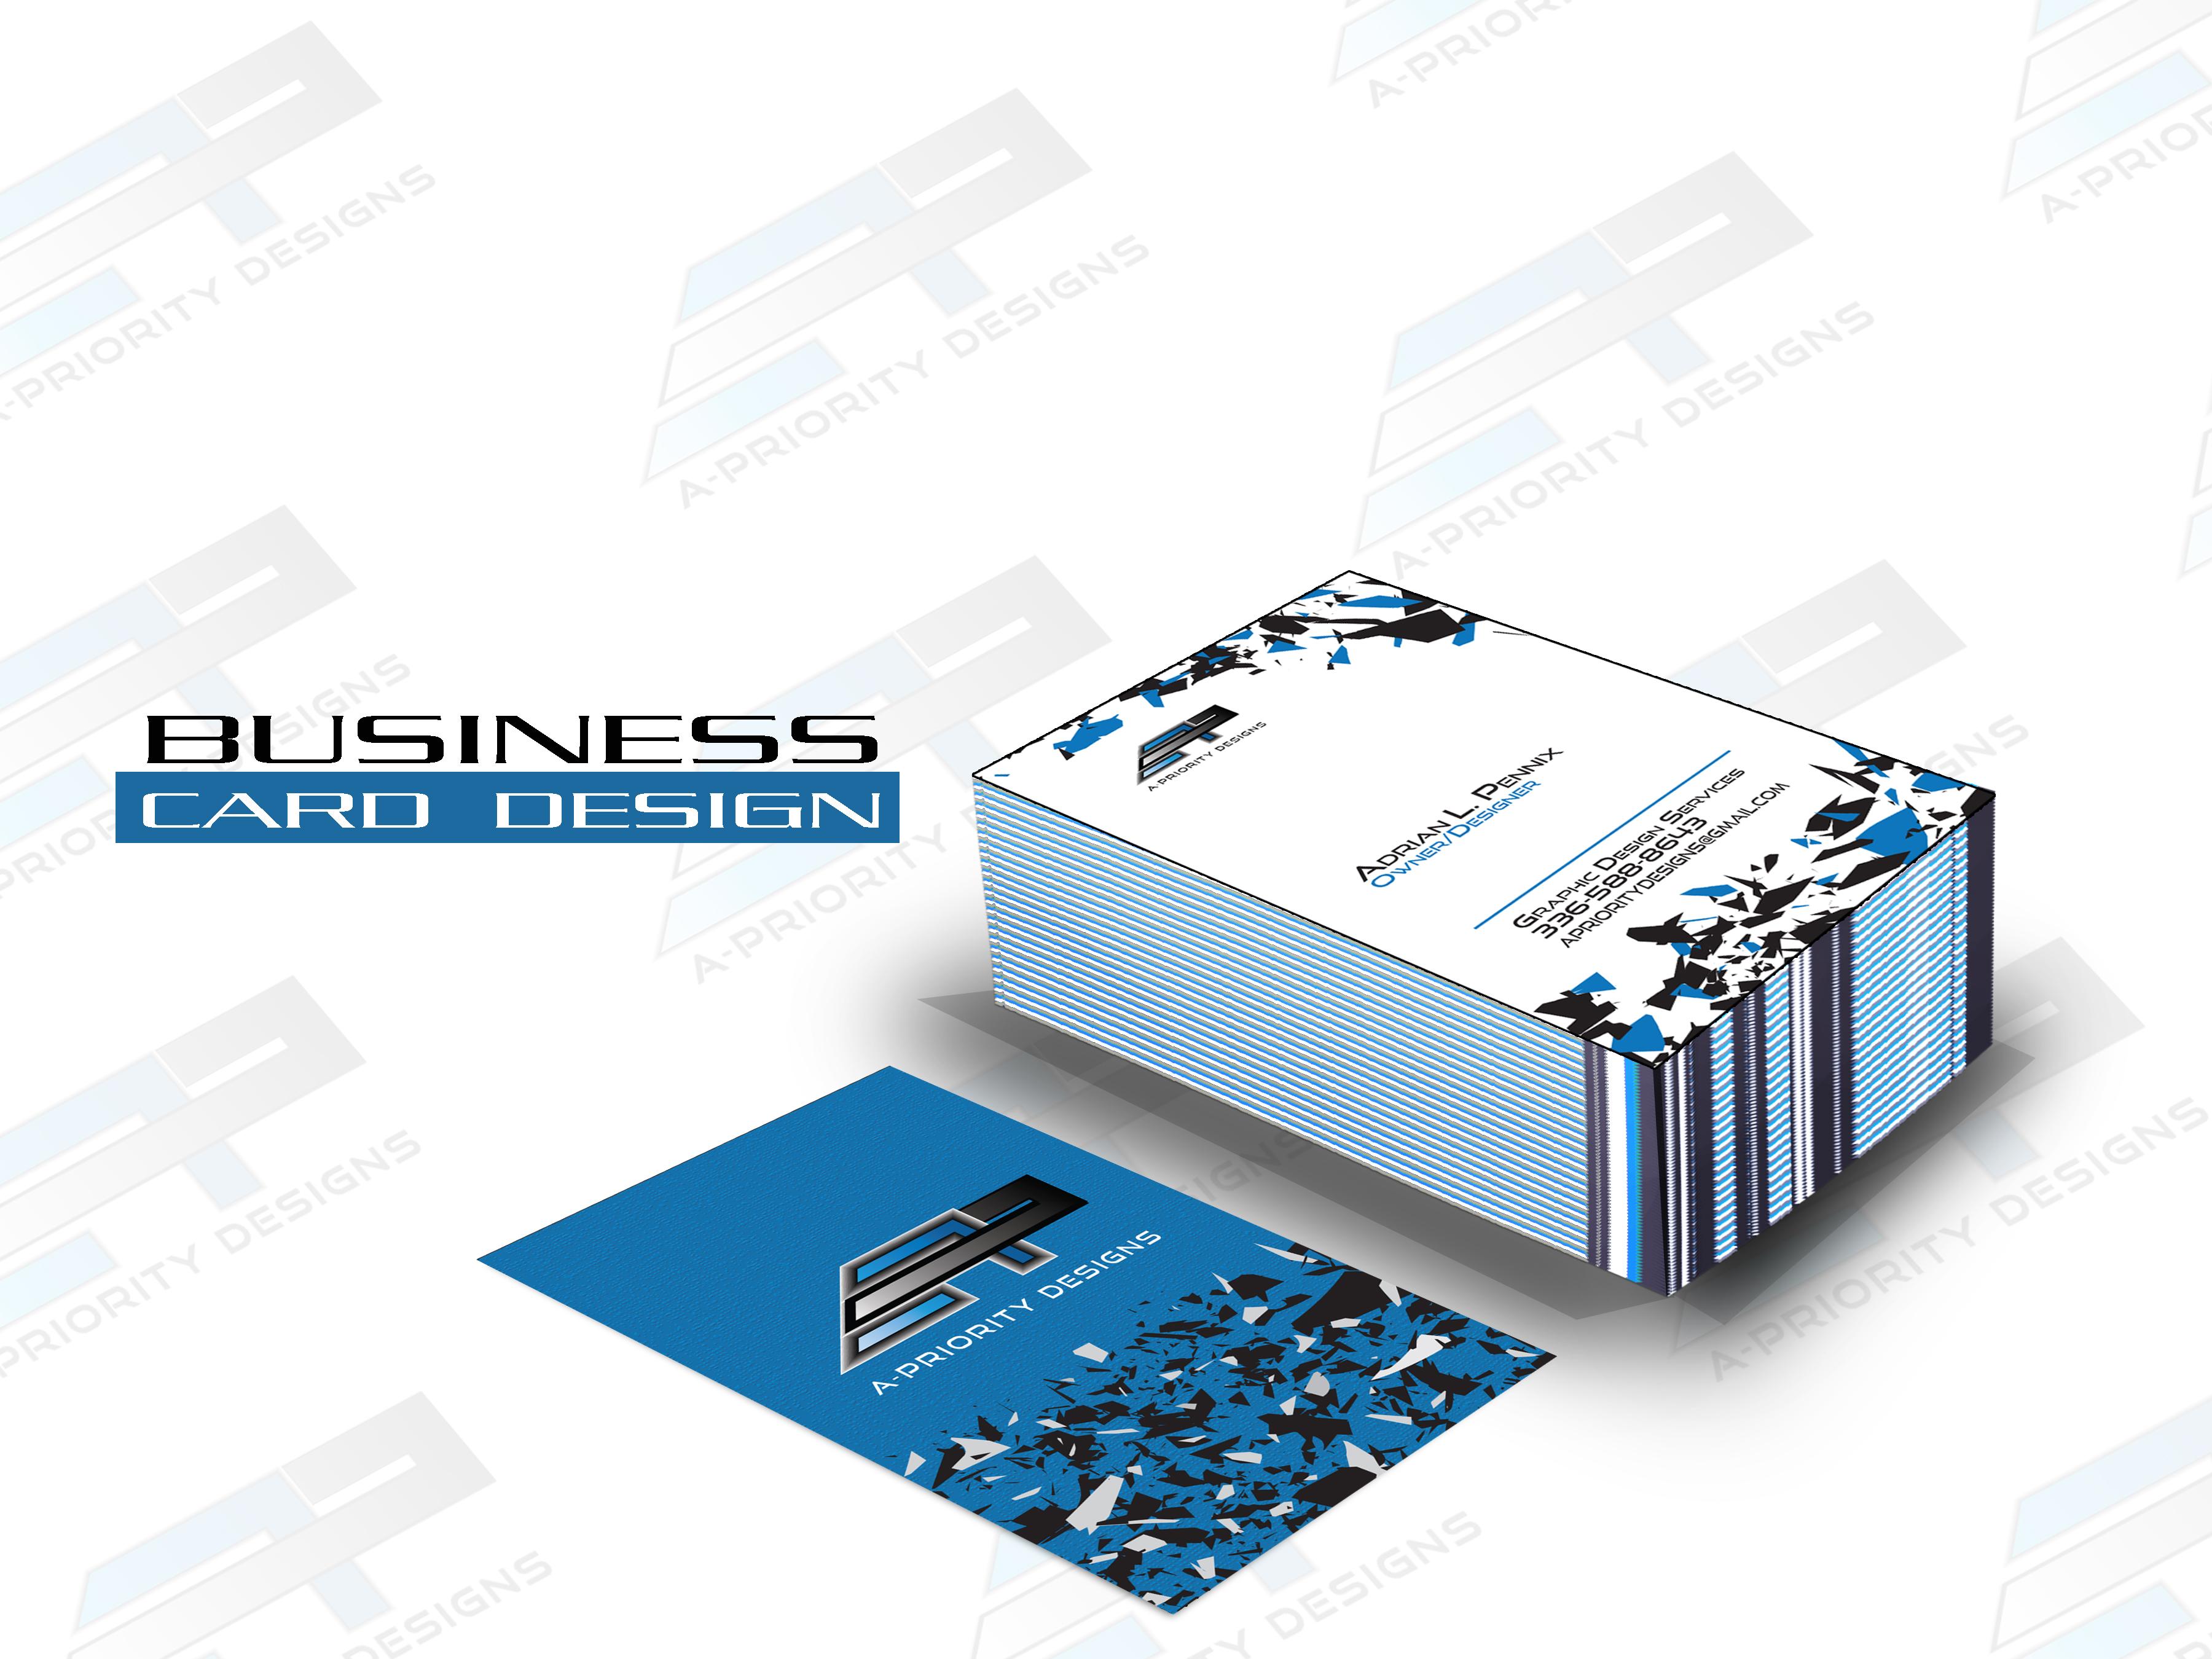 Business-card-display